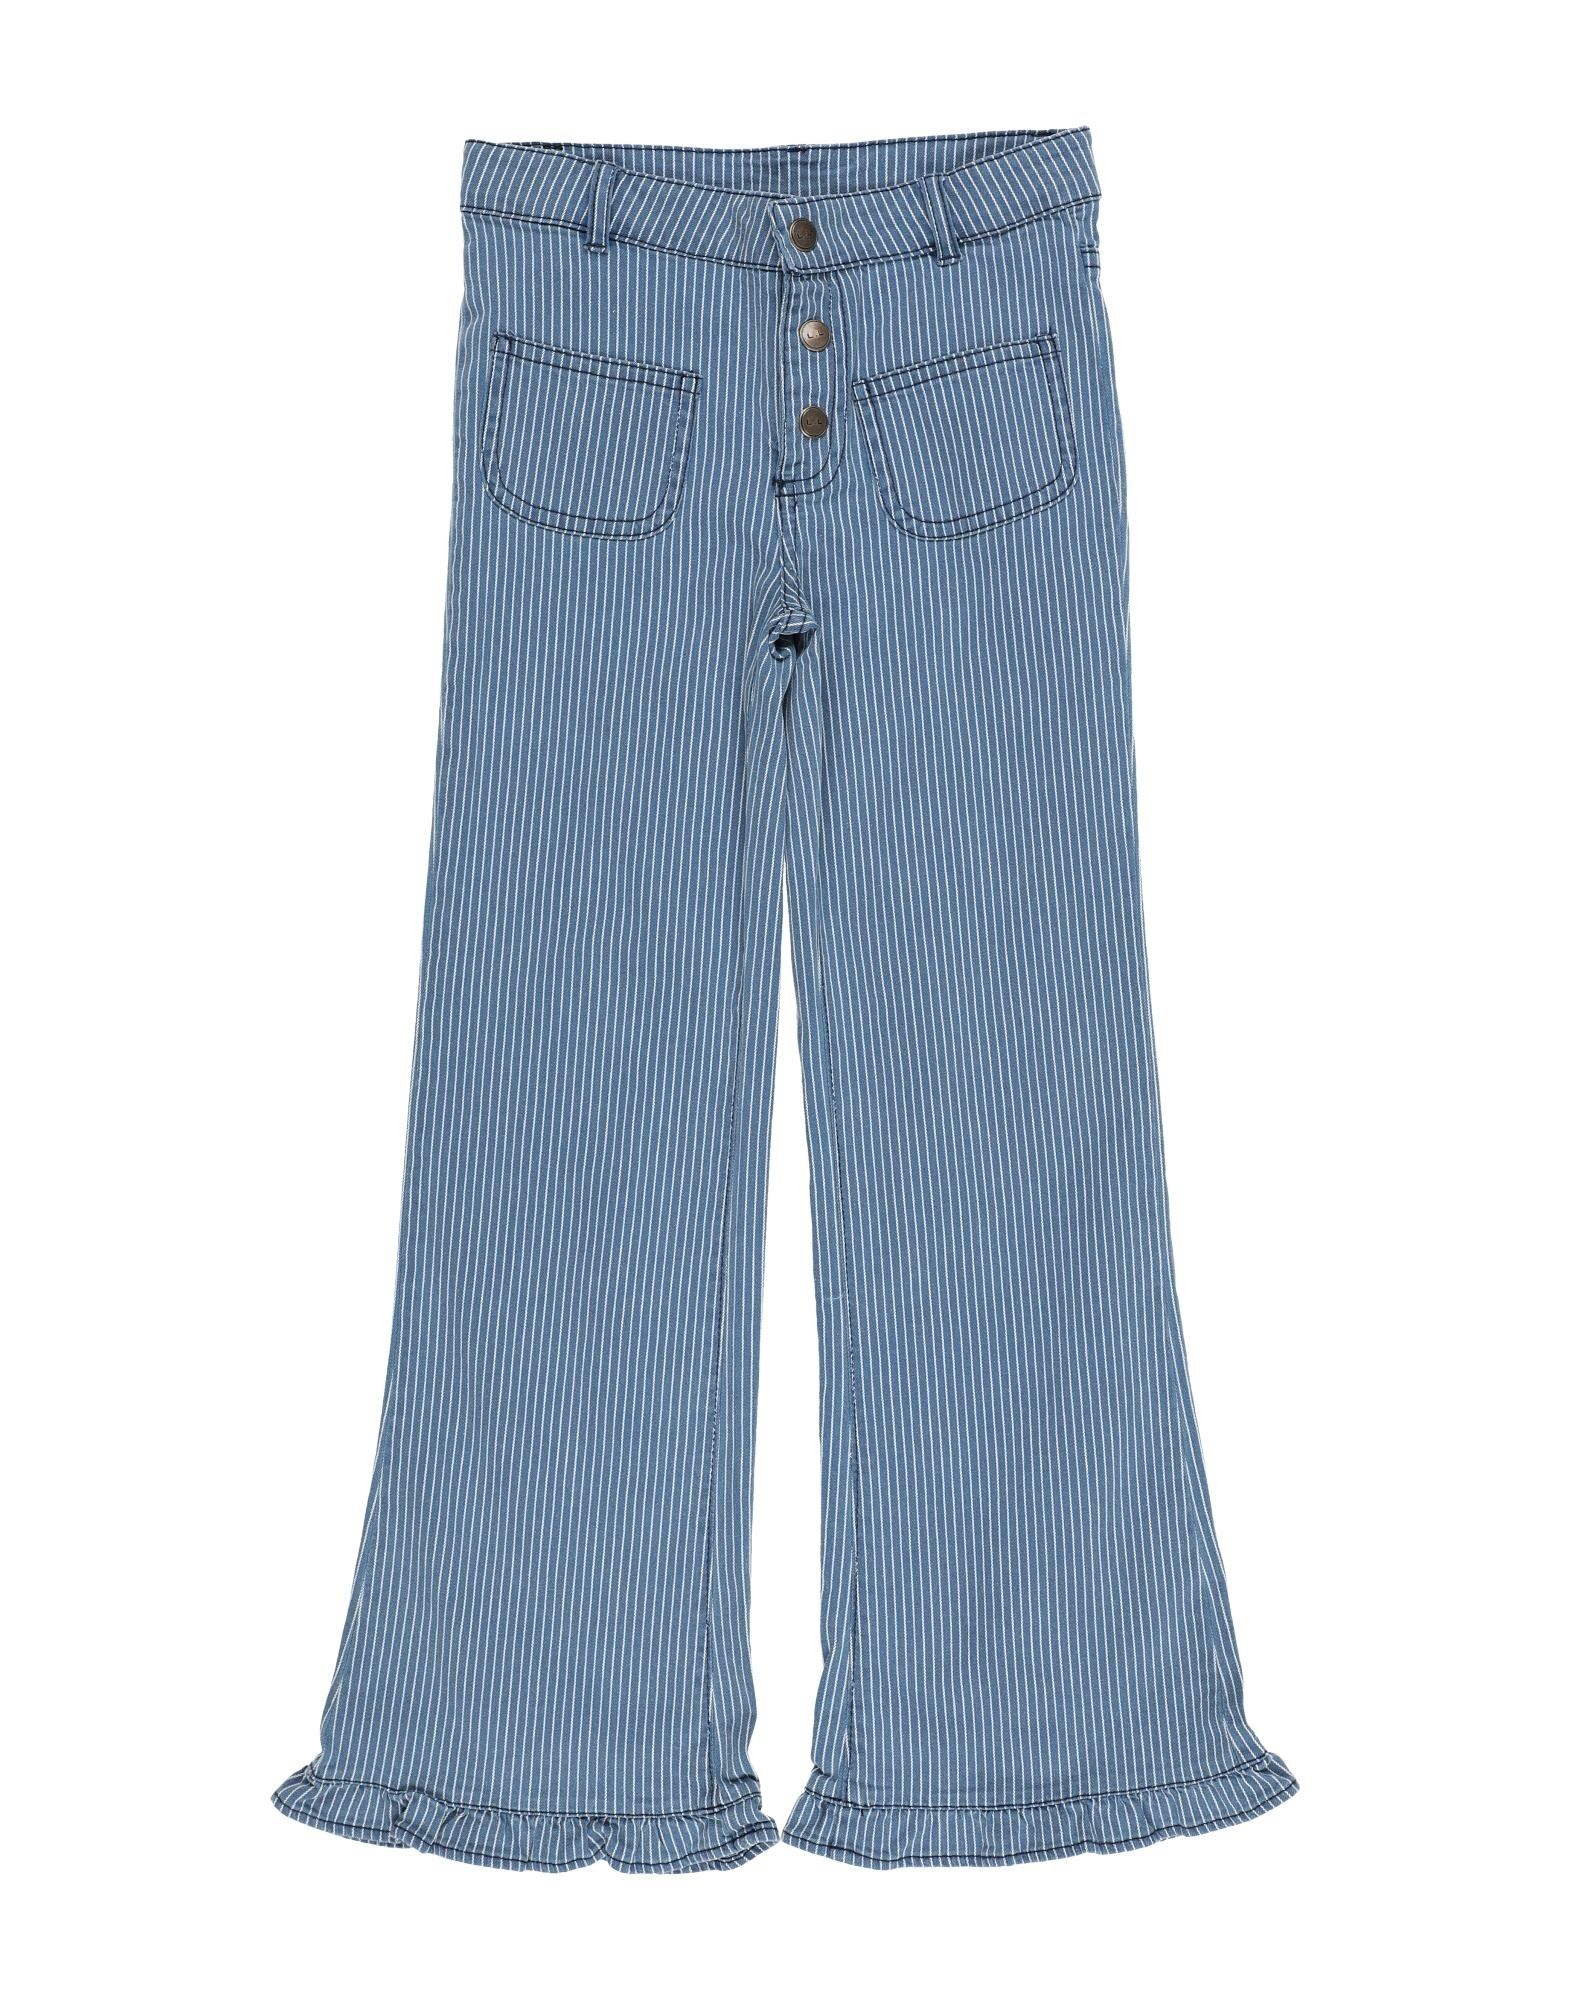 Louis Louise Kids' Casual Pants In Blue